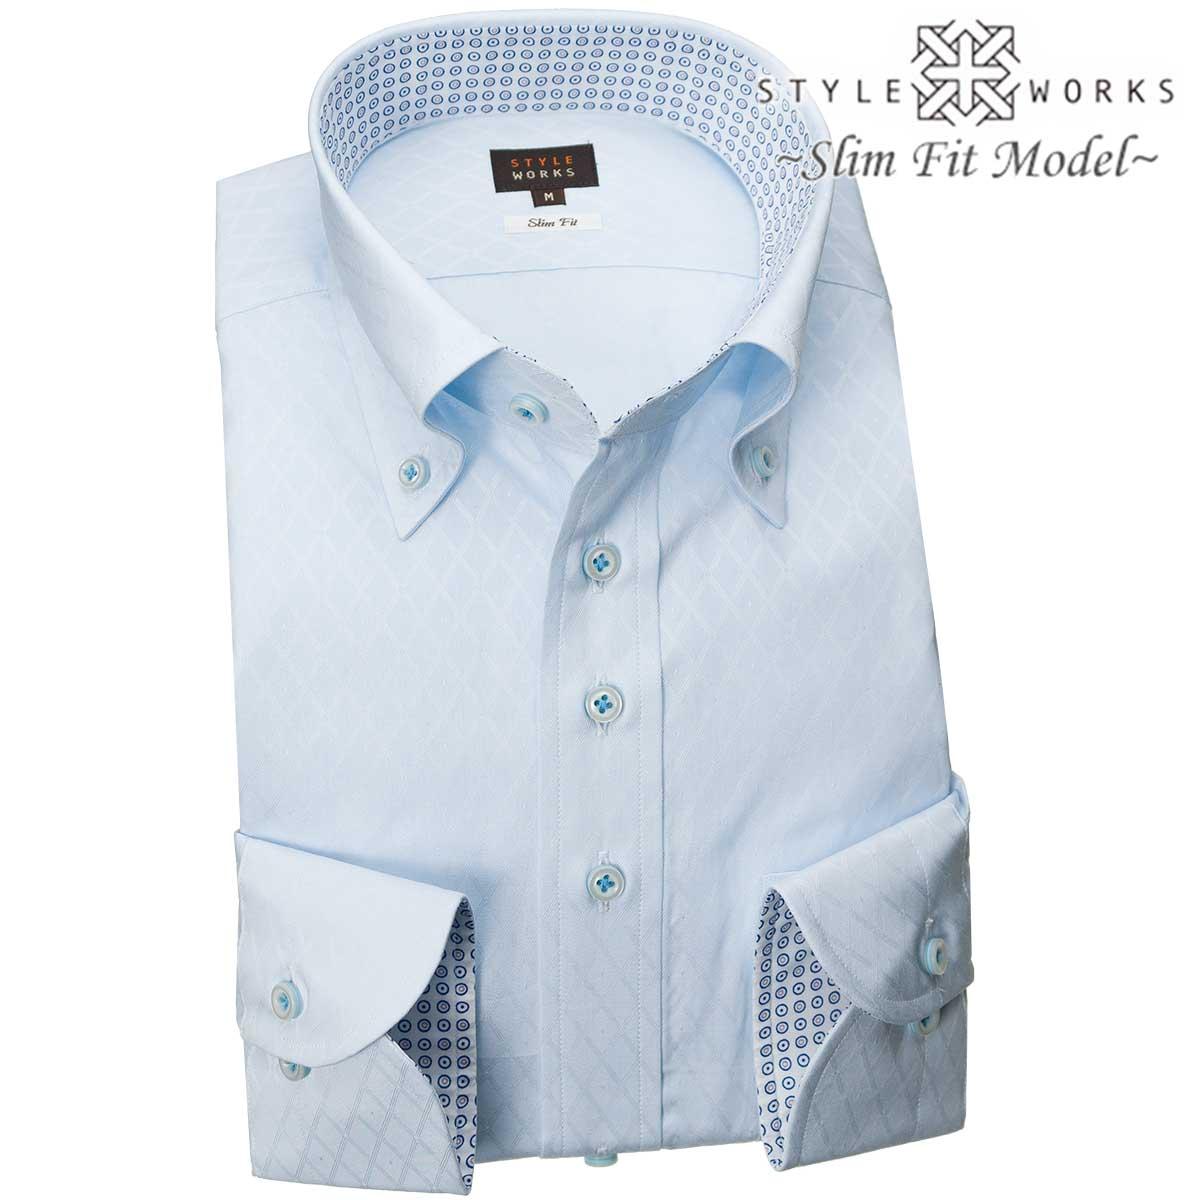 236b7c5b1b4 1811 domestic production long sleeves dress shirt slim fitting light blue  jacquard texture diagram check pin dot men fs3gm who are button-downed